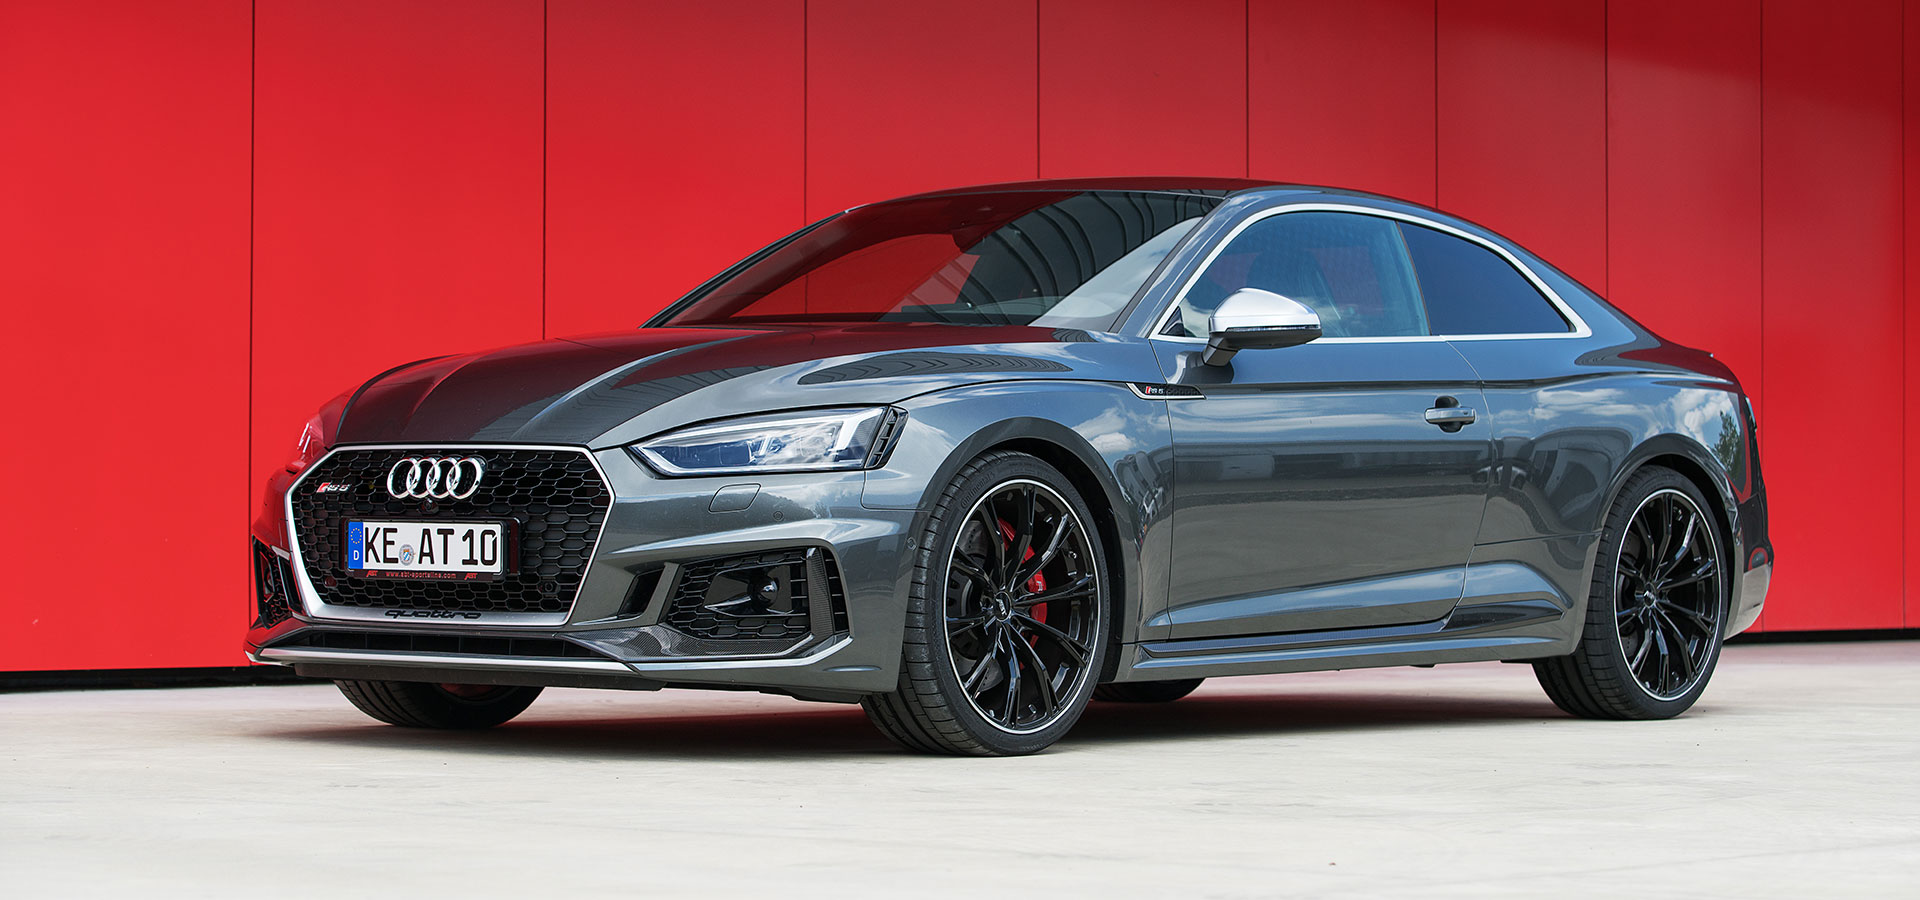 Audi RS5 - ABT Sportsline